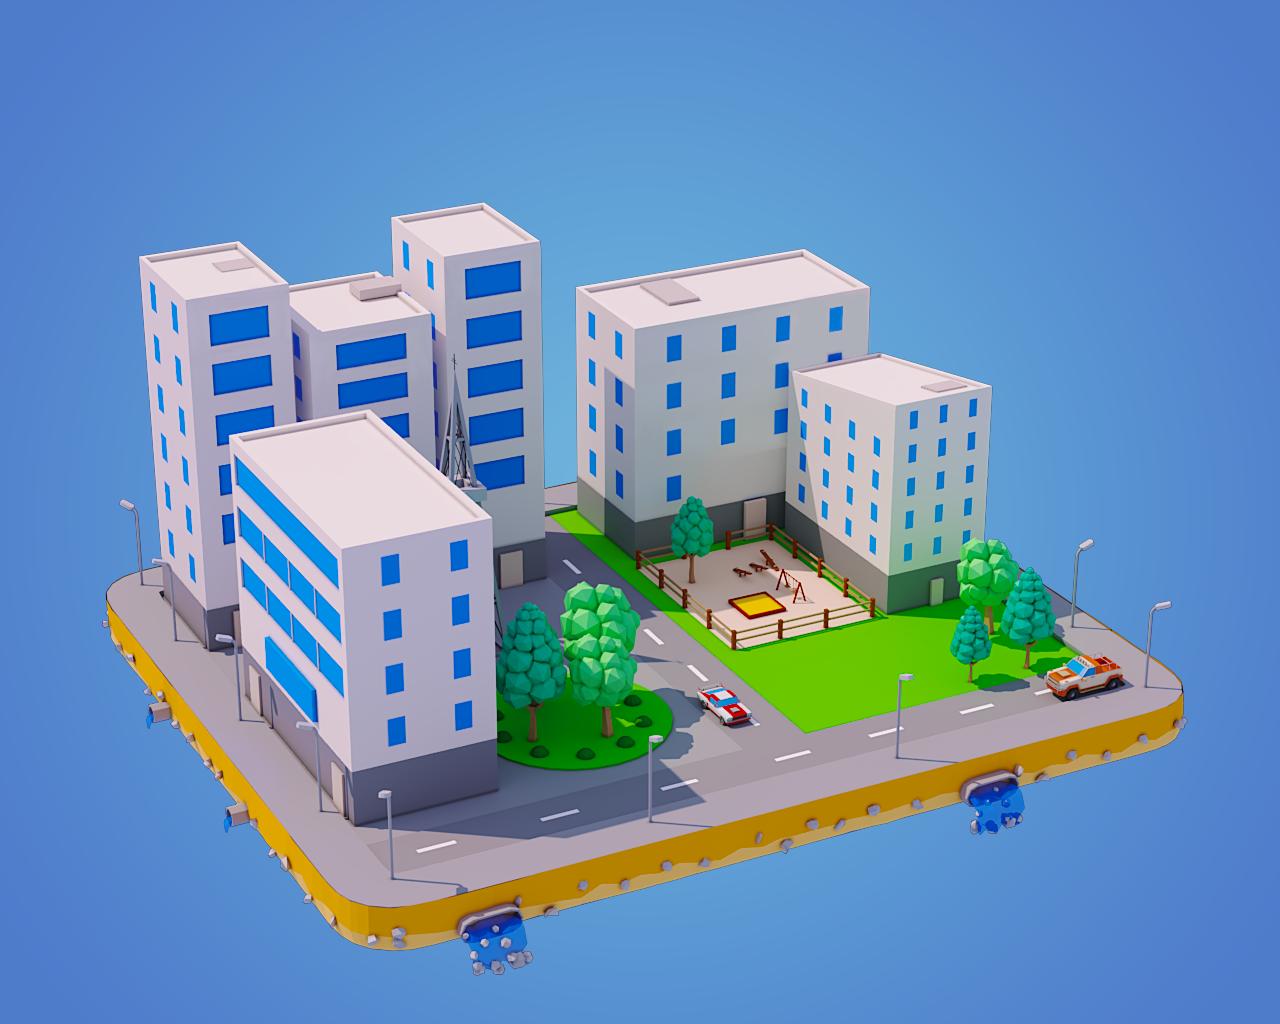 Low Poly City Block